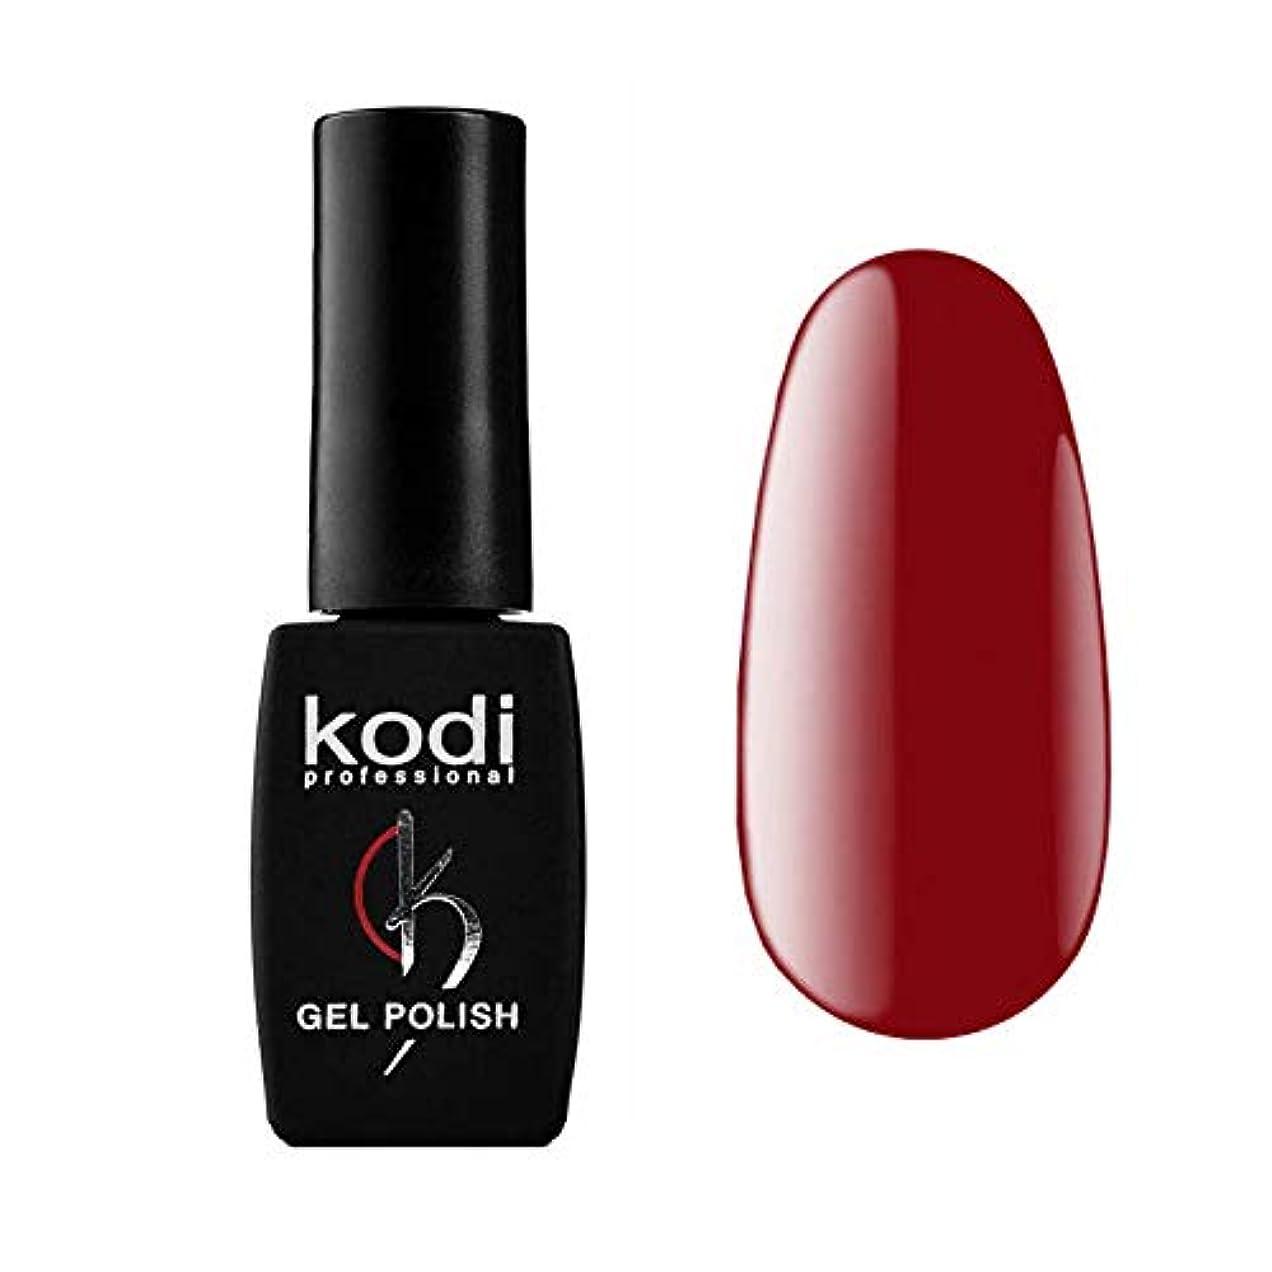 Kodi Professional New Collection R RED #20 Color Gel Nail Polish 12ml 0.42 Fl Oz LED UV Genuine Soak Off